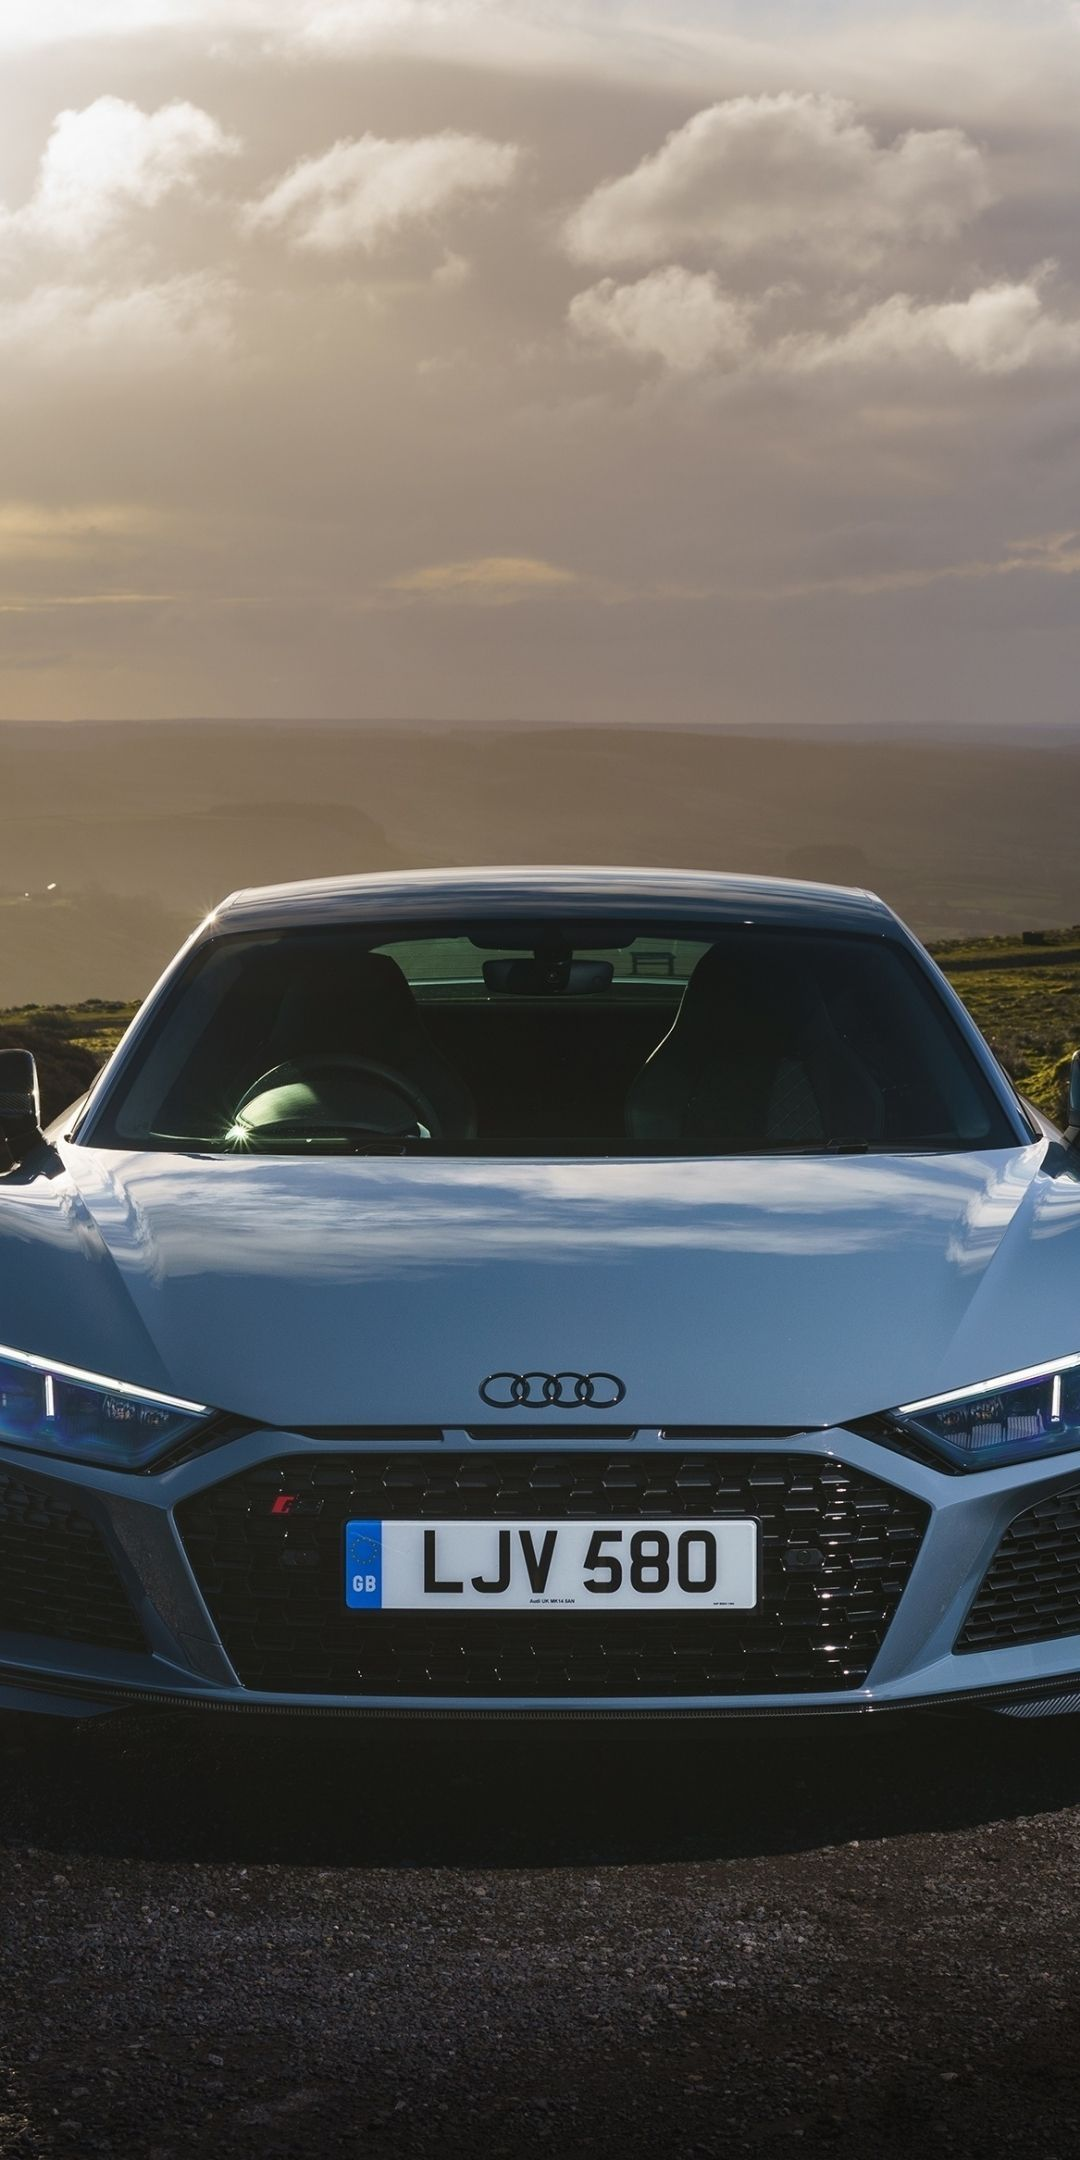 Off Road Audi R8 V10 Luxury Car 1080x2160 Wallpaper Audi R8 Audi R8 V10 Luxury Cars